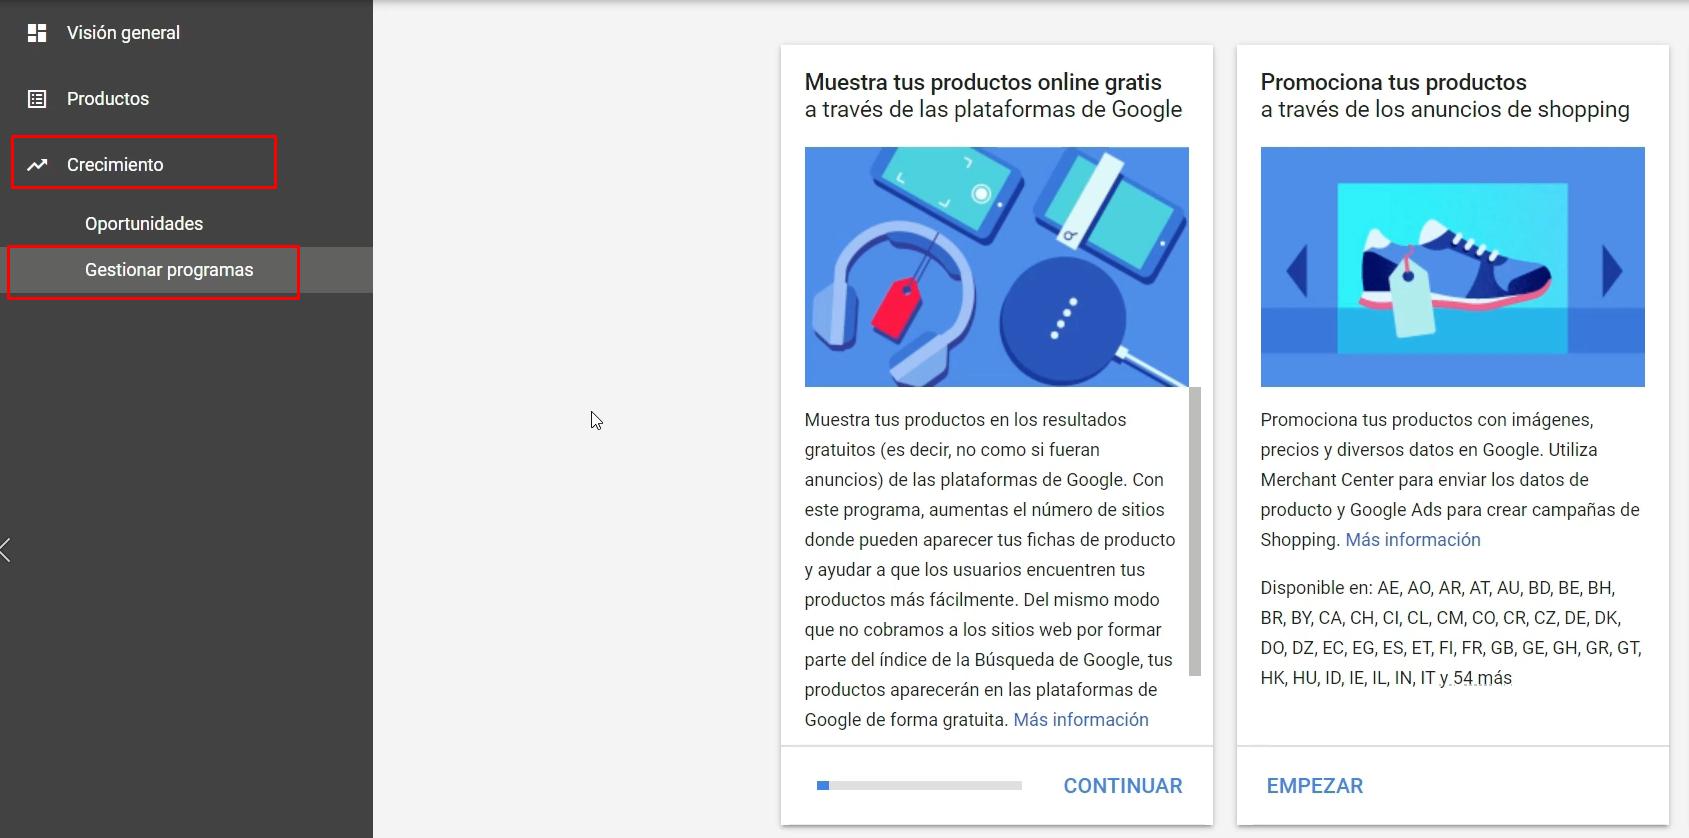 Gestionar programas Google Merchant Center